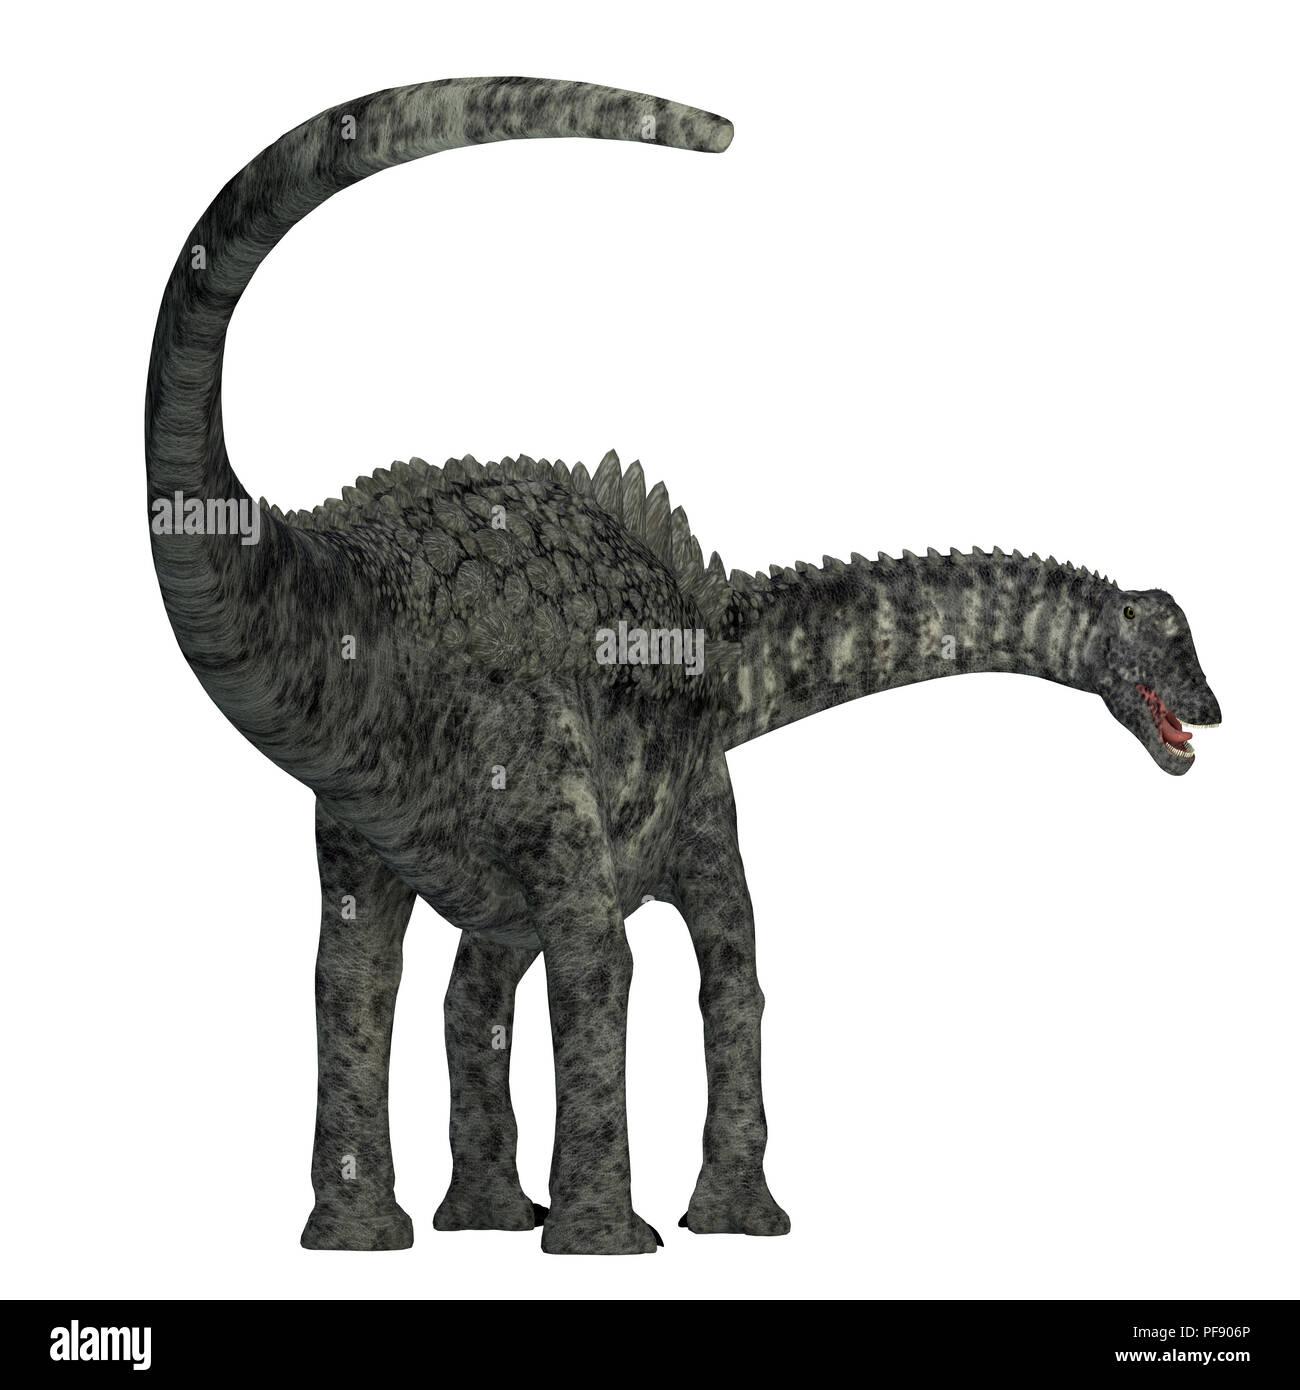 Ampelosaurus Dinosaur - Ampelosaurus was a herbivorous sauropod dinosaur that lived in Europe during the Cretaceous Period. - Stock Image